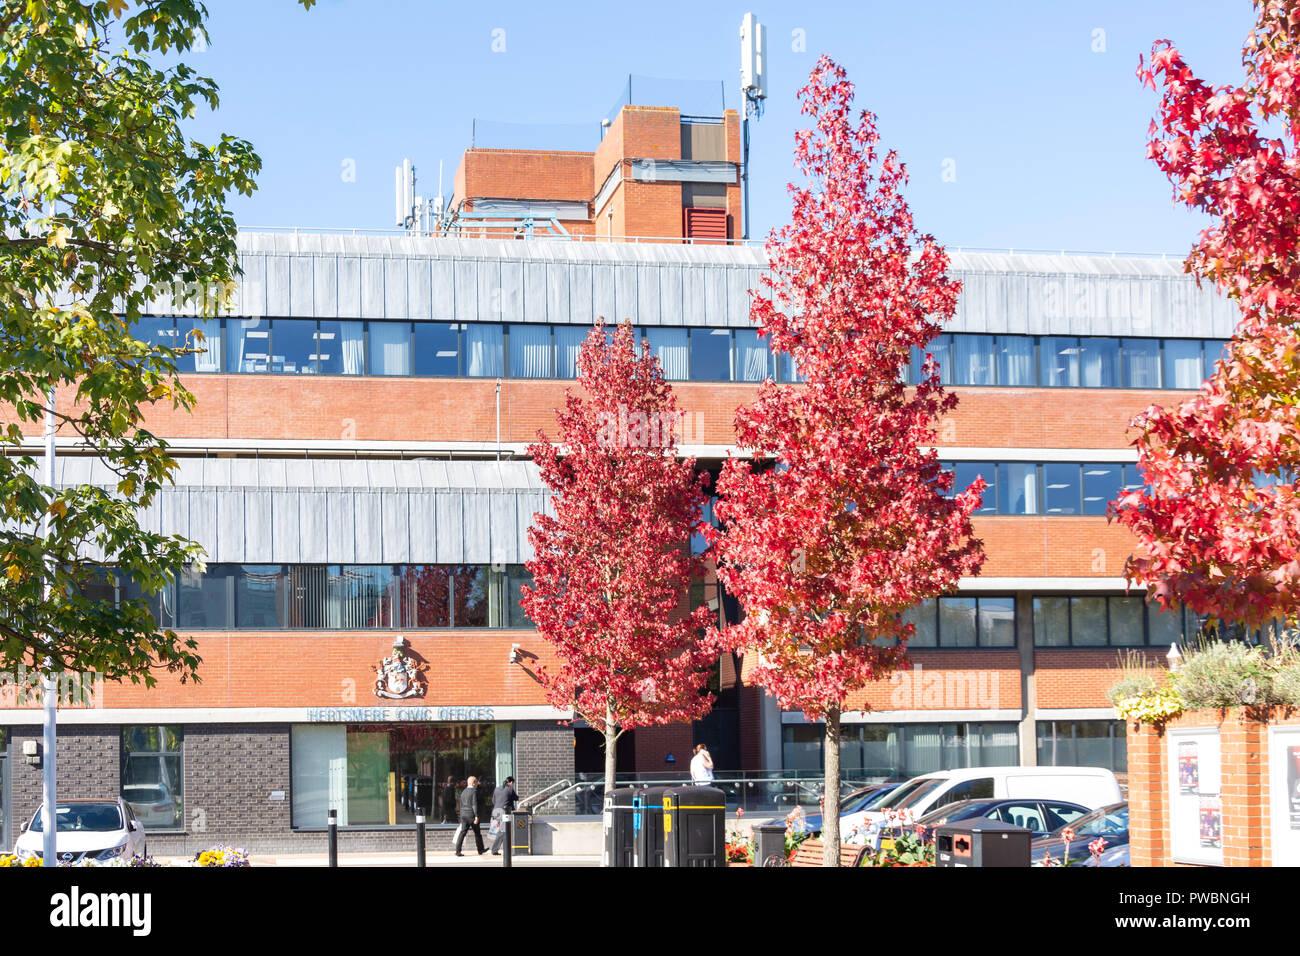 Hertsmere Bureaux municipaux (Mairie), Shenley Road, Newquay, Hertfordshire, Angleterre, Royaume-Uni Banque D'Images